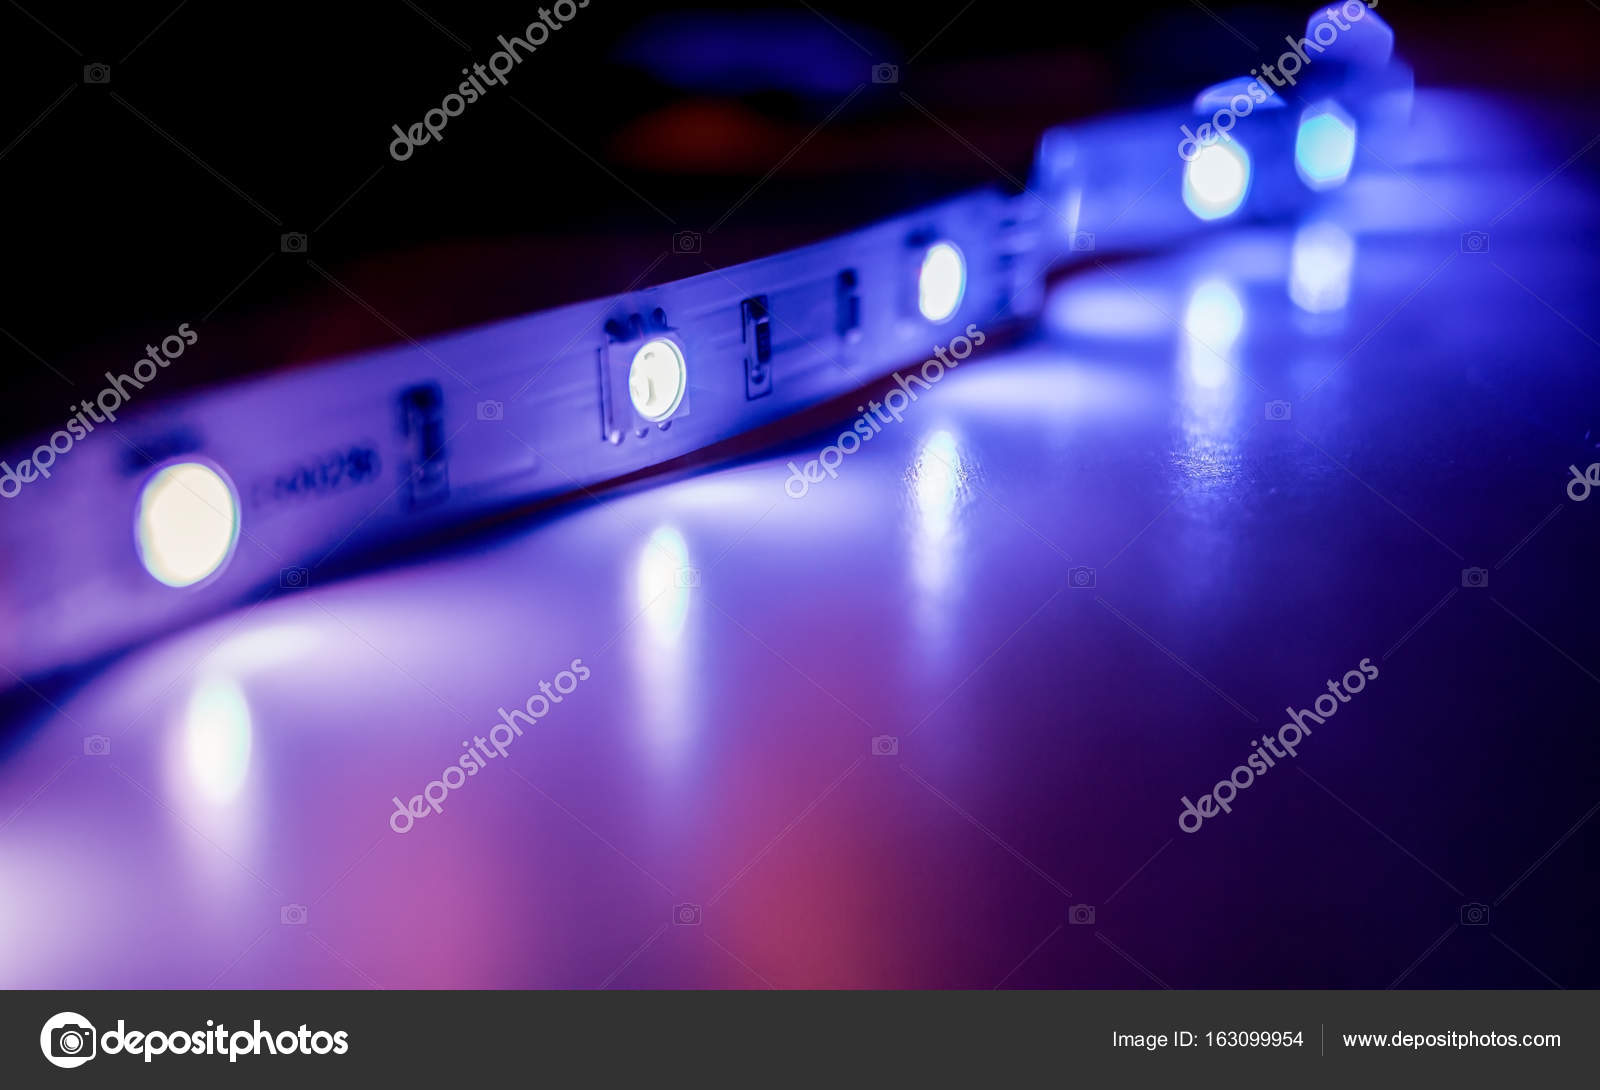 https://st3.depositphotos.com/5387844/16309/i/1600/depositphotos_163099954-stockafbeelding-led-strip-verlichting.jpg